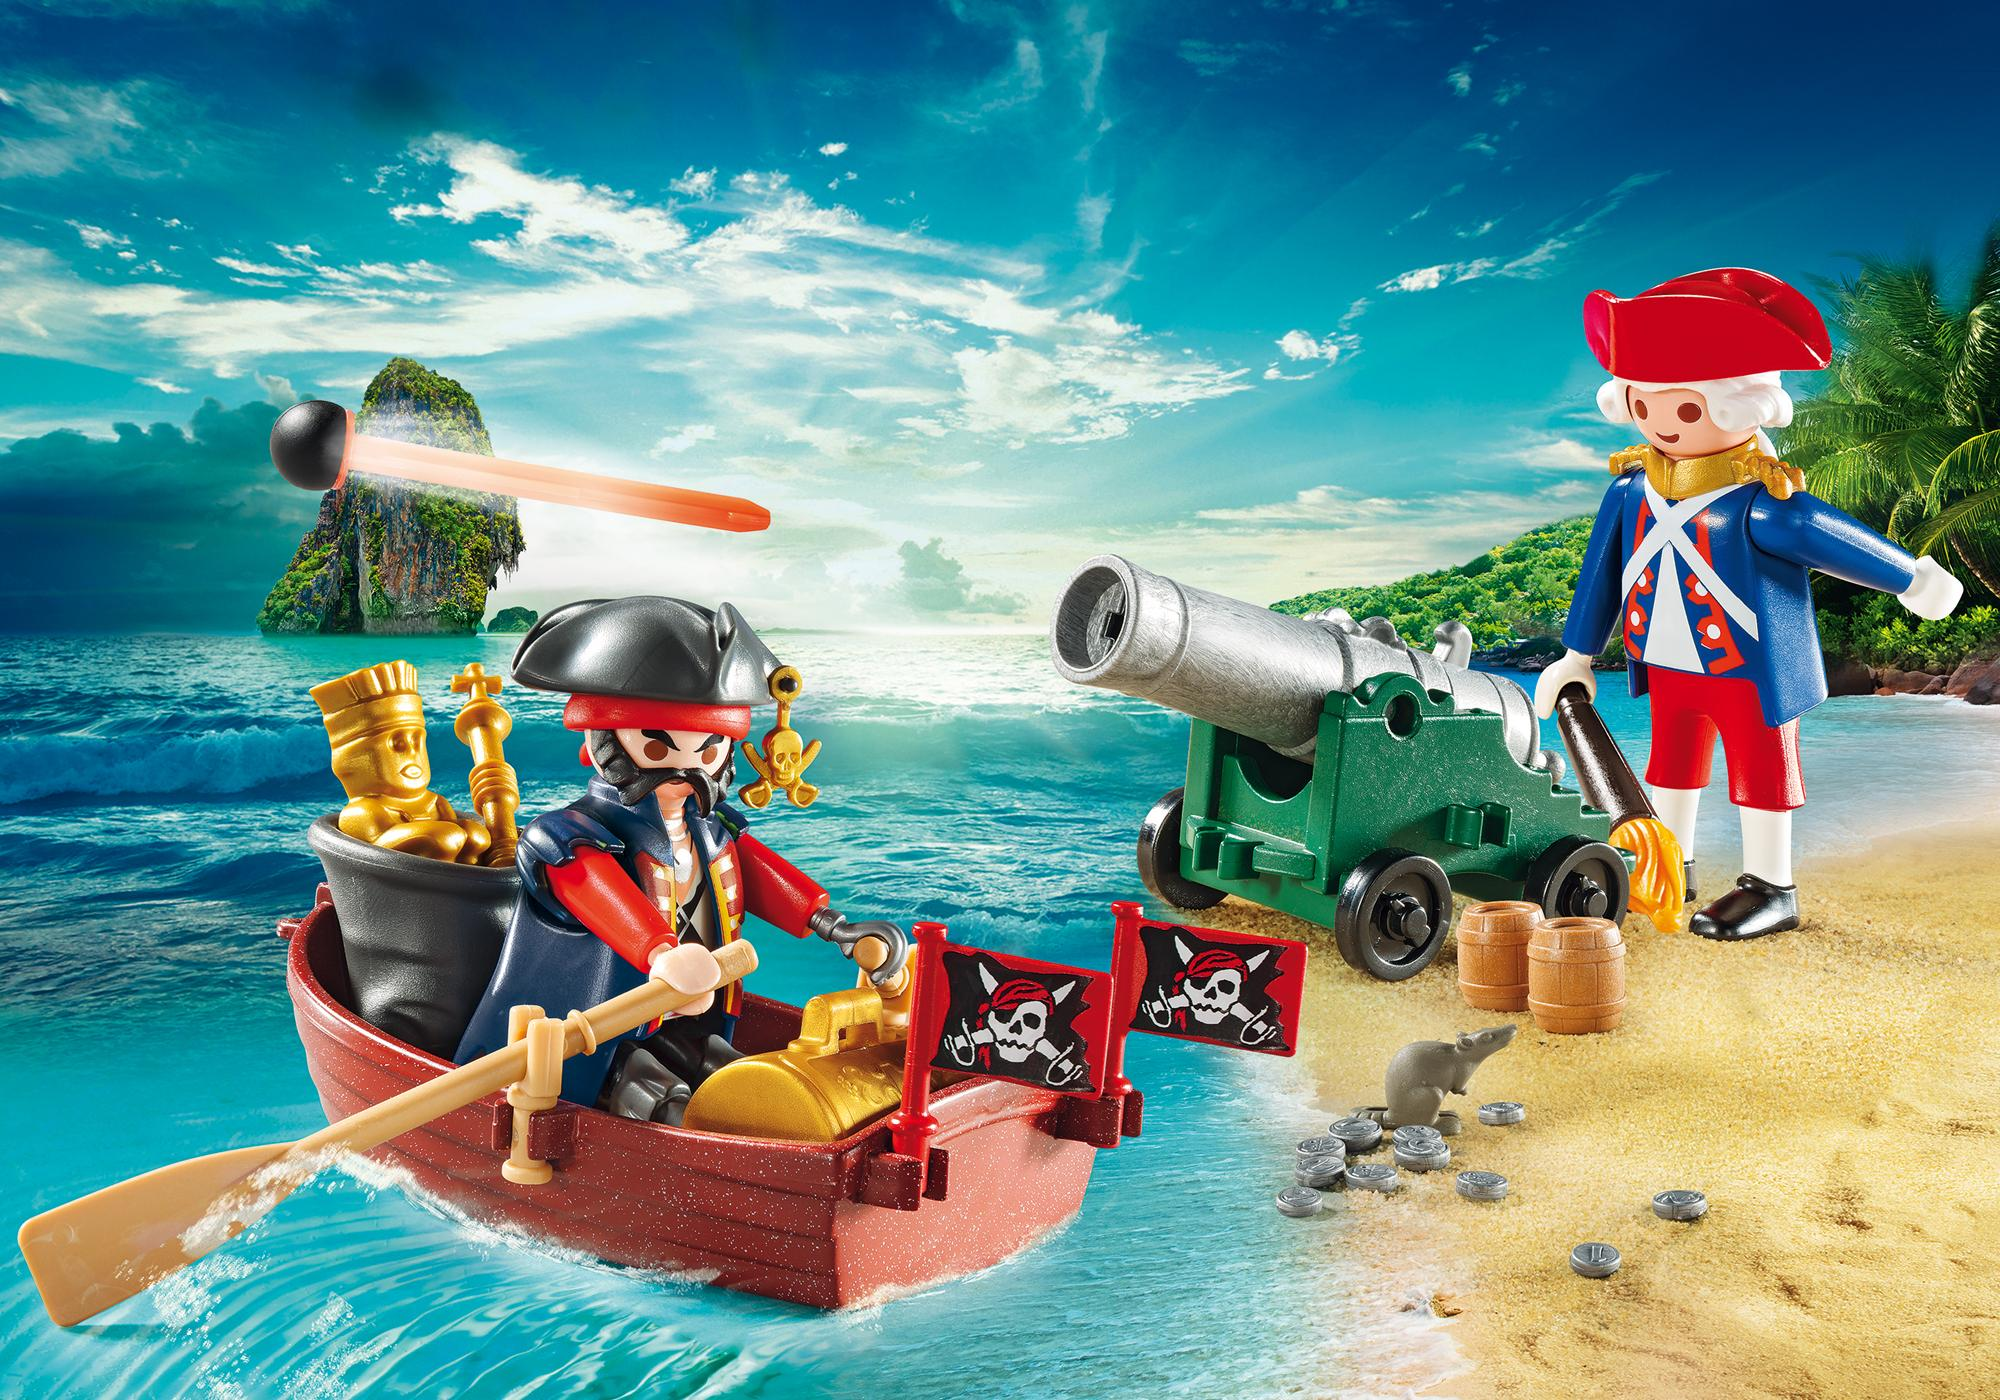 http://media.playmobil.com/i/playmobil/9102_product_detail/Maletín Grande Pirata y Soldado